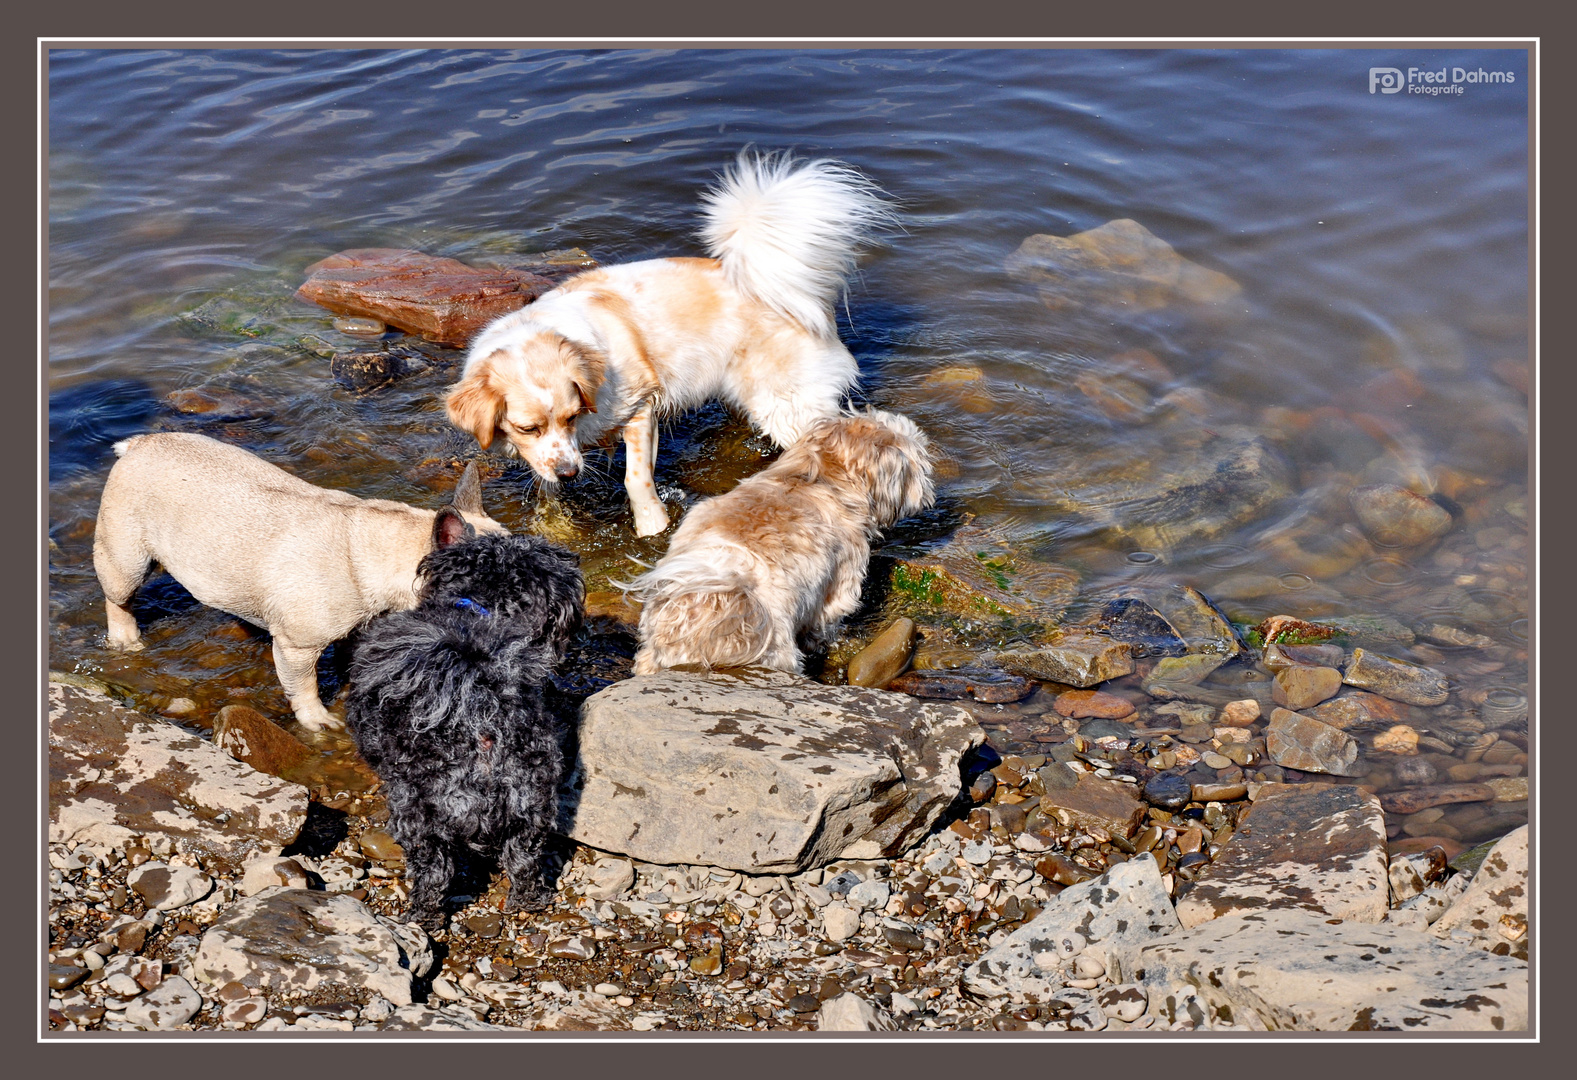 Amy, Badespaß mit Freunden